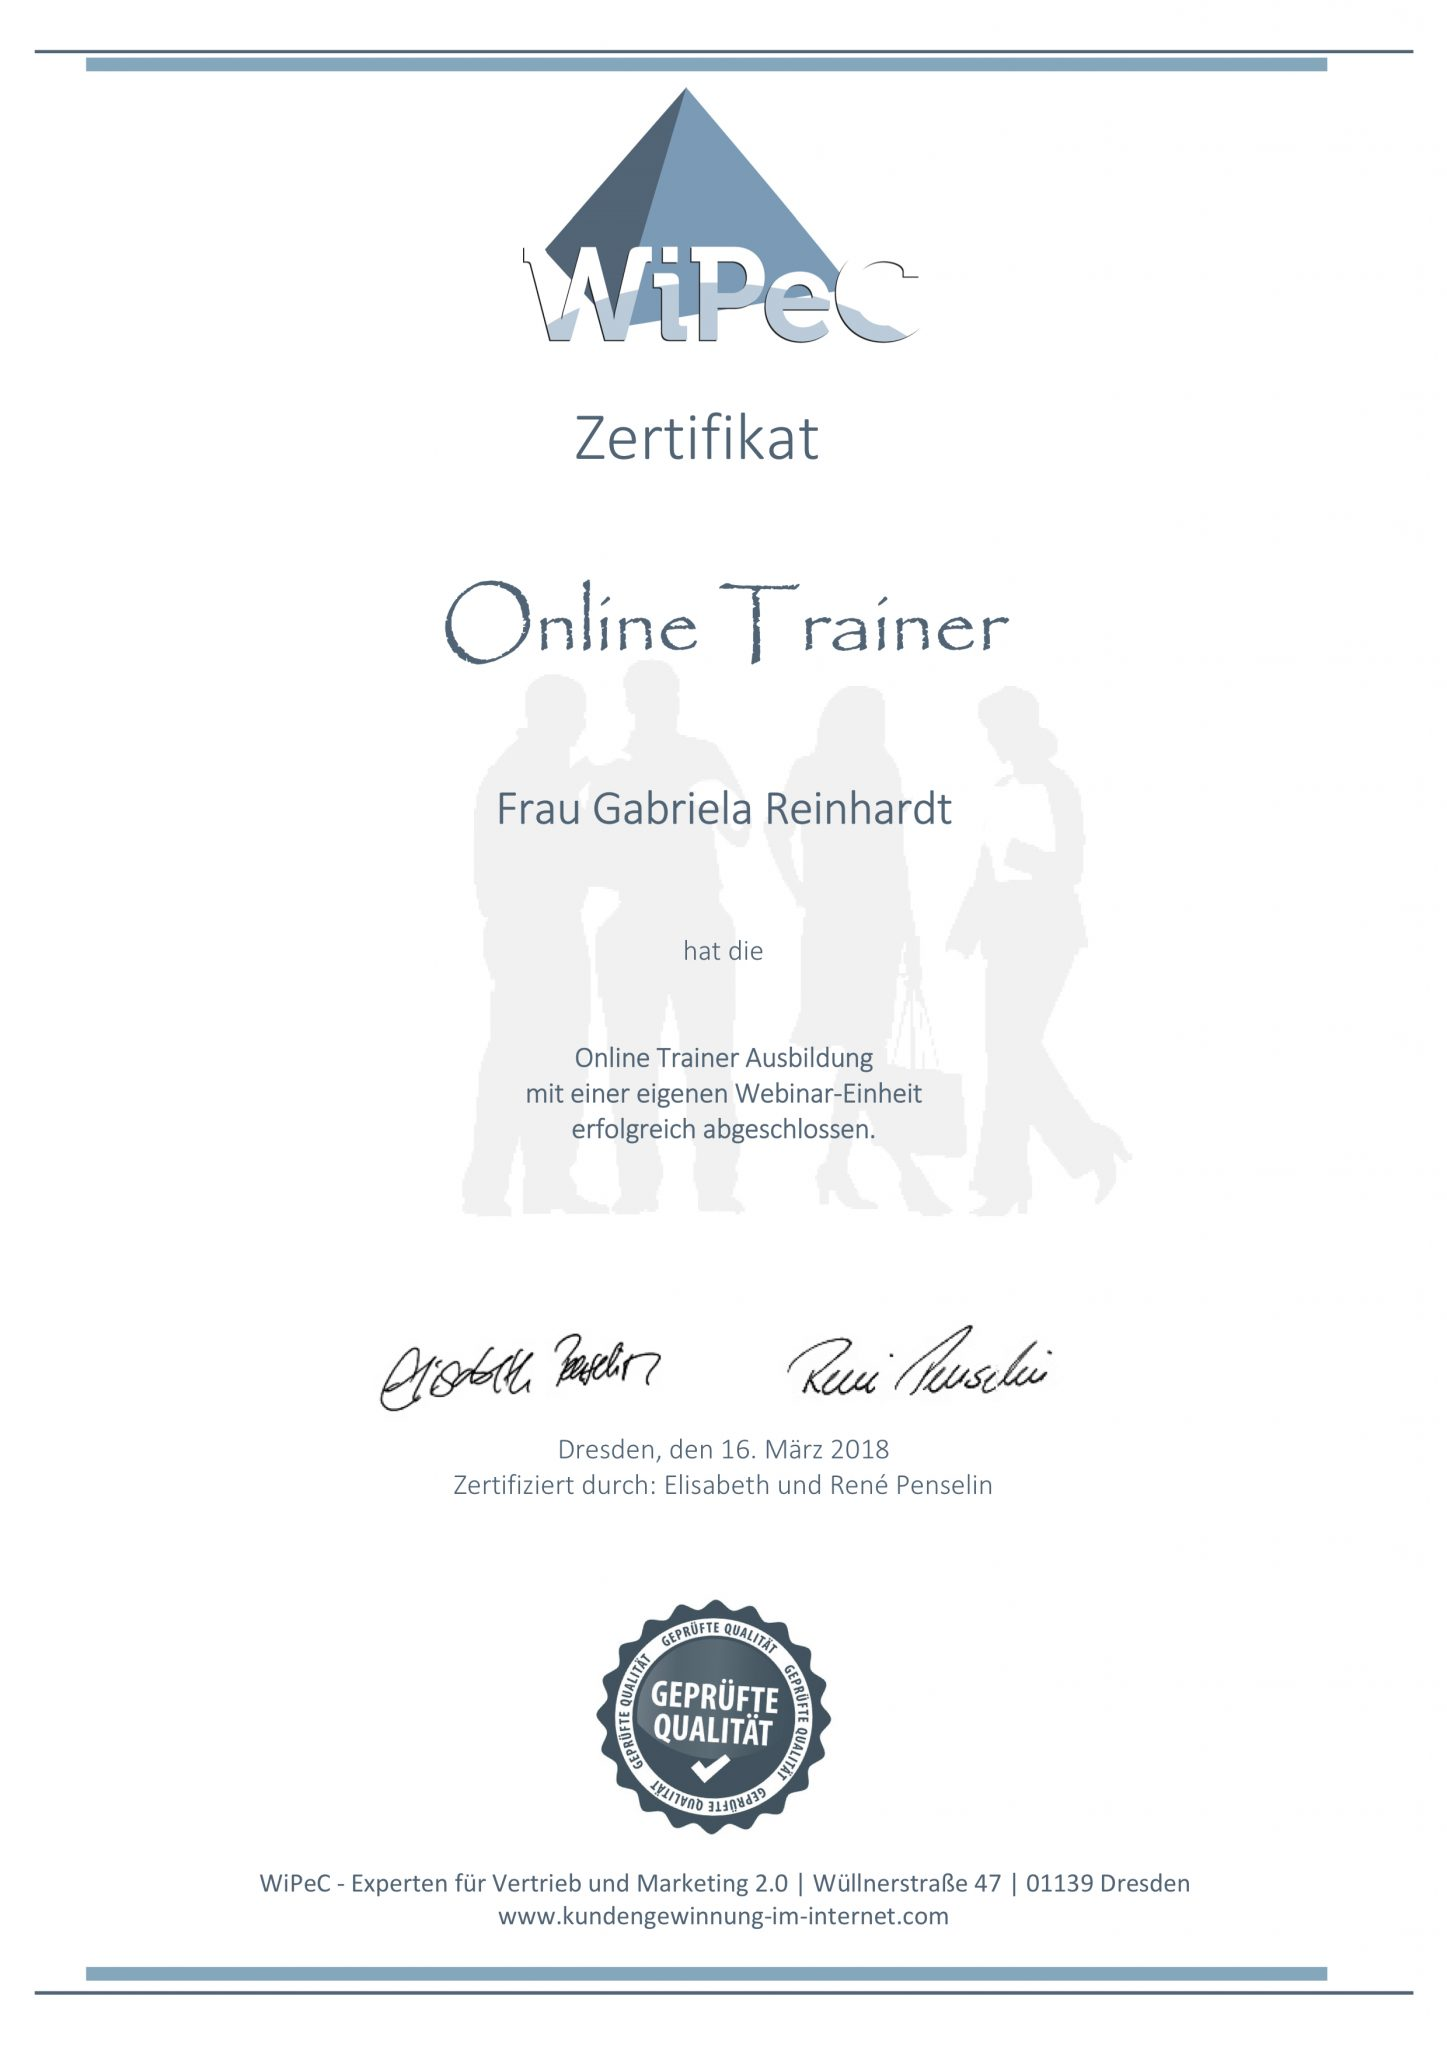 RGH-Consulting | Gabriela Reinhardt | Zertifikate | Zertifikat Online Trainer WiPec